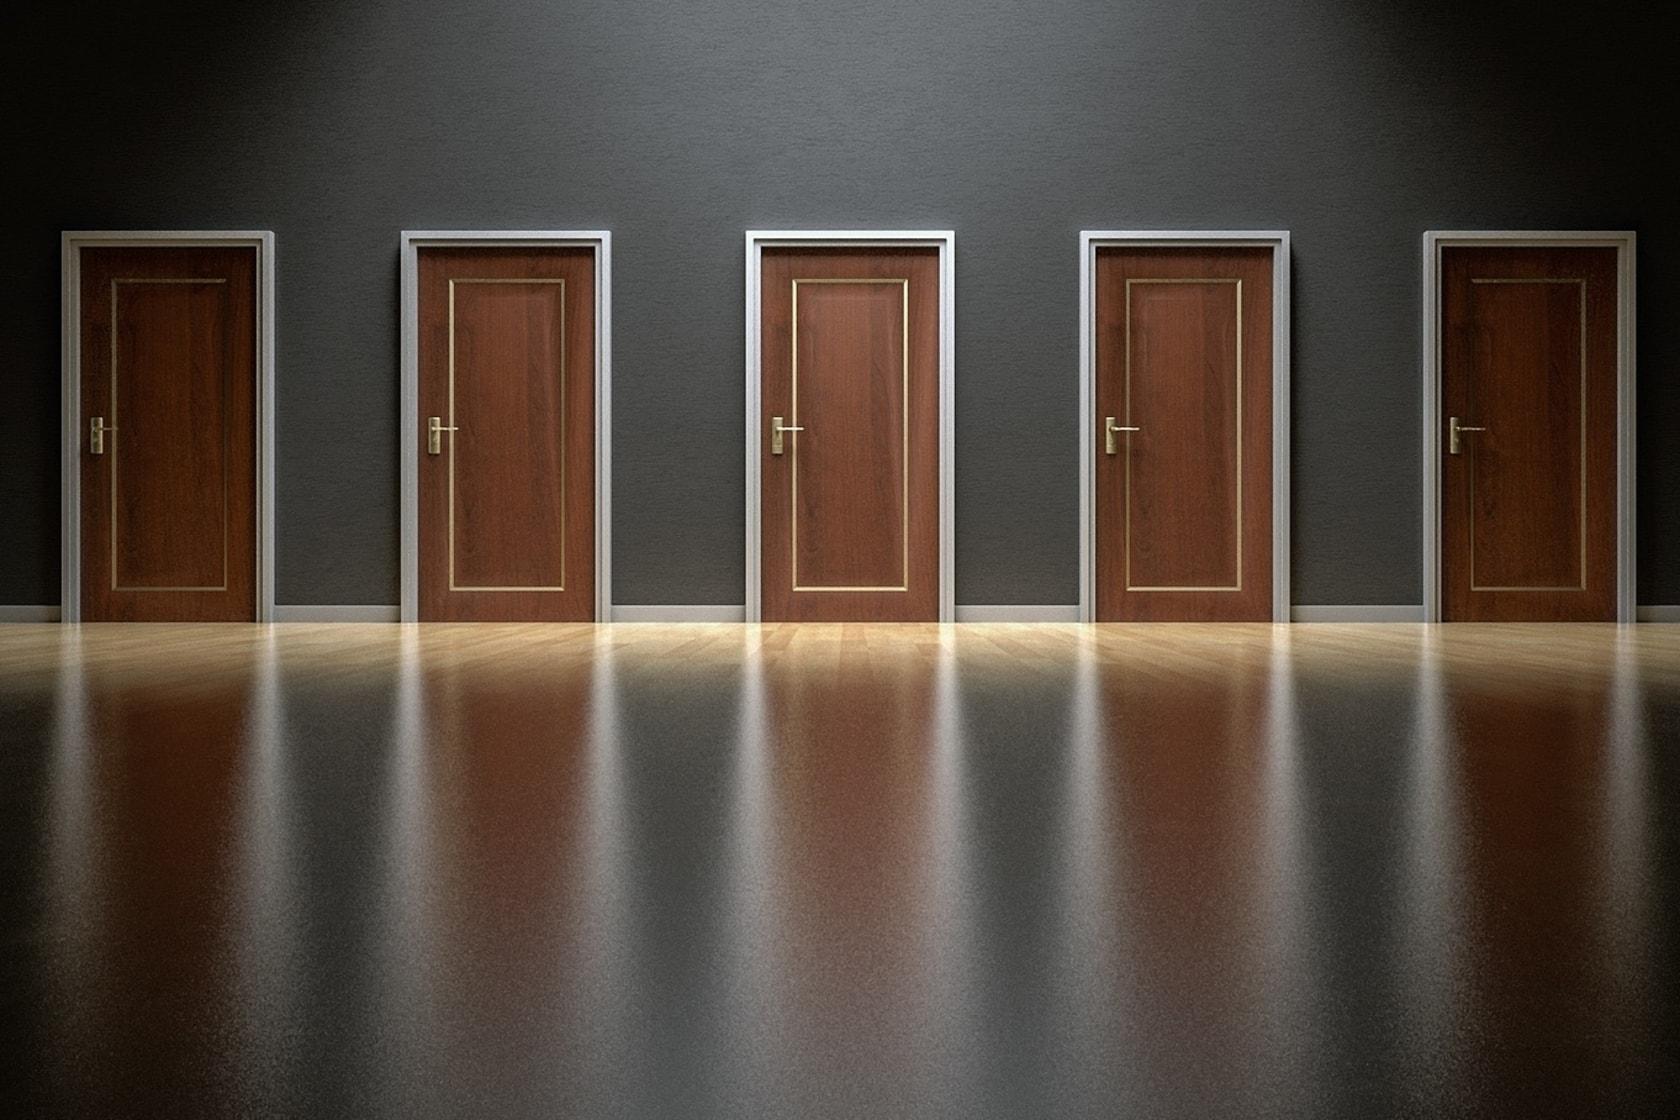 Choose A Door - Small Business Website Builder vs Custom Website Design